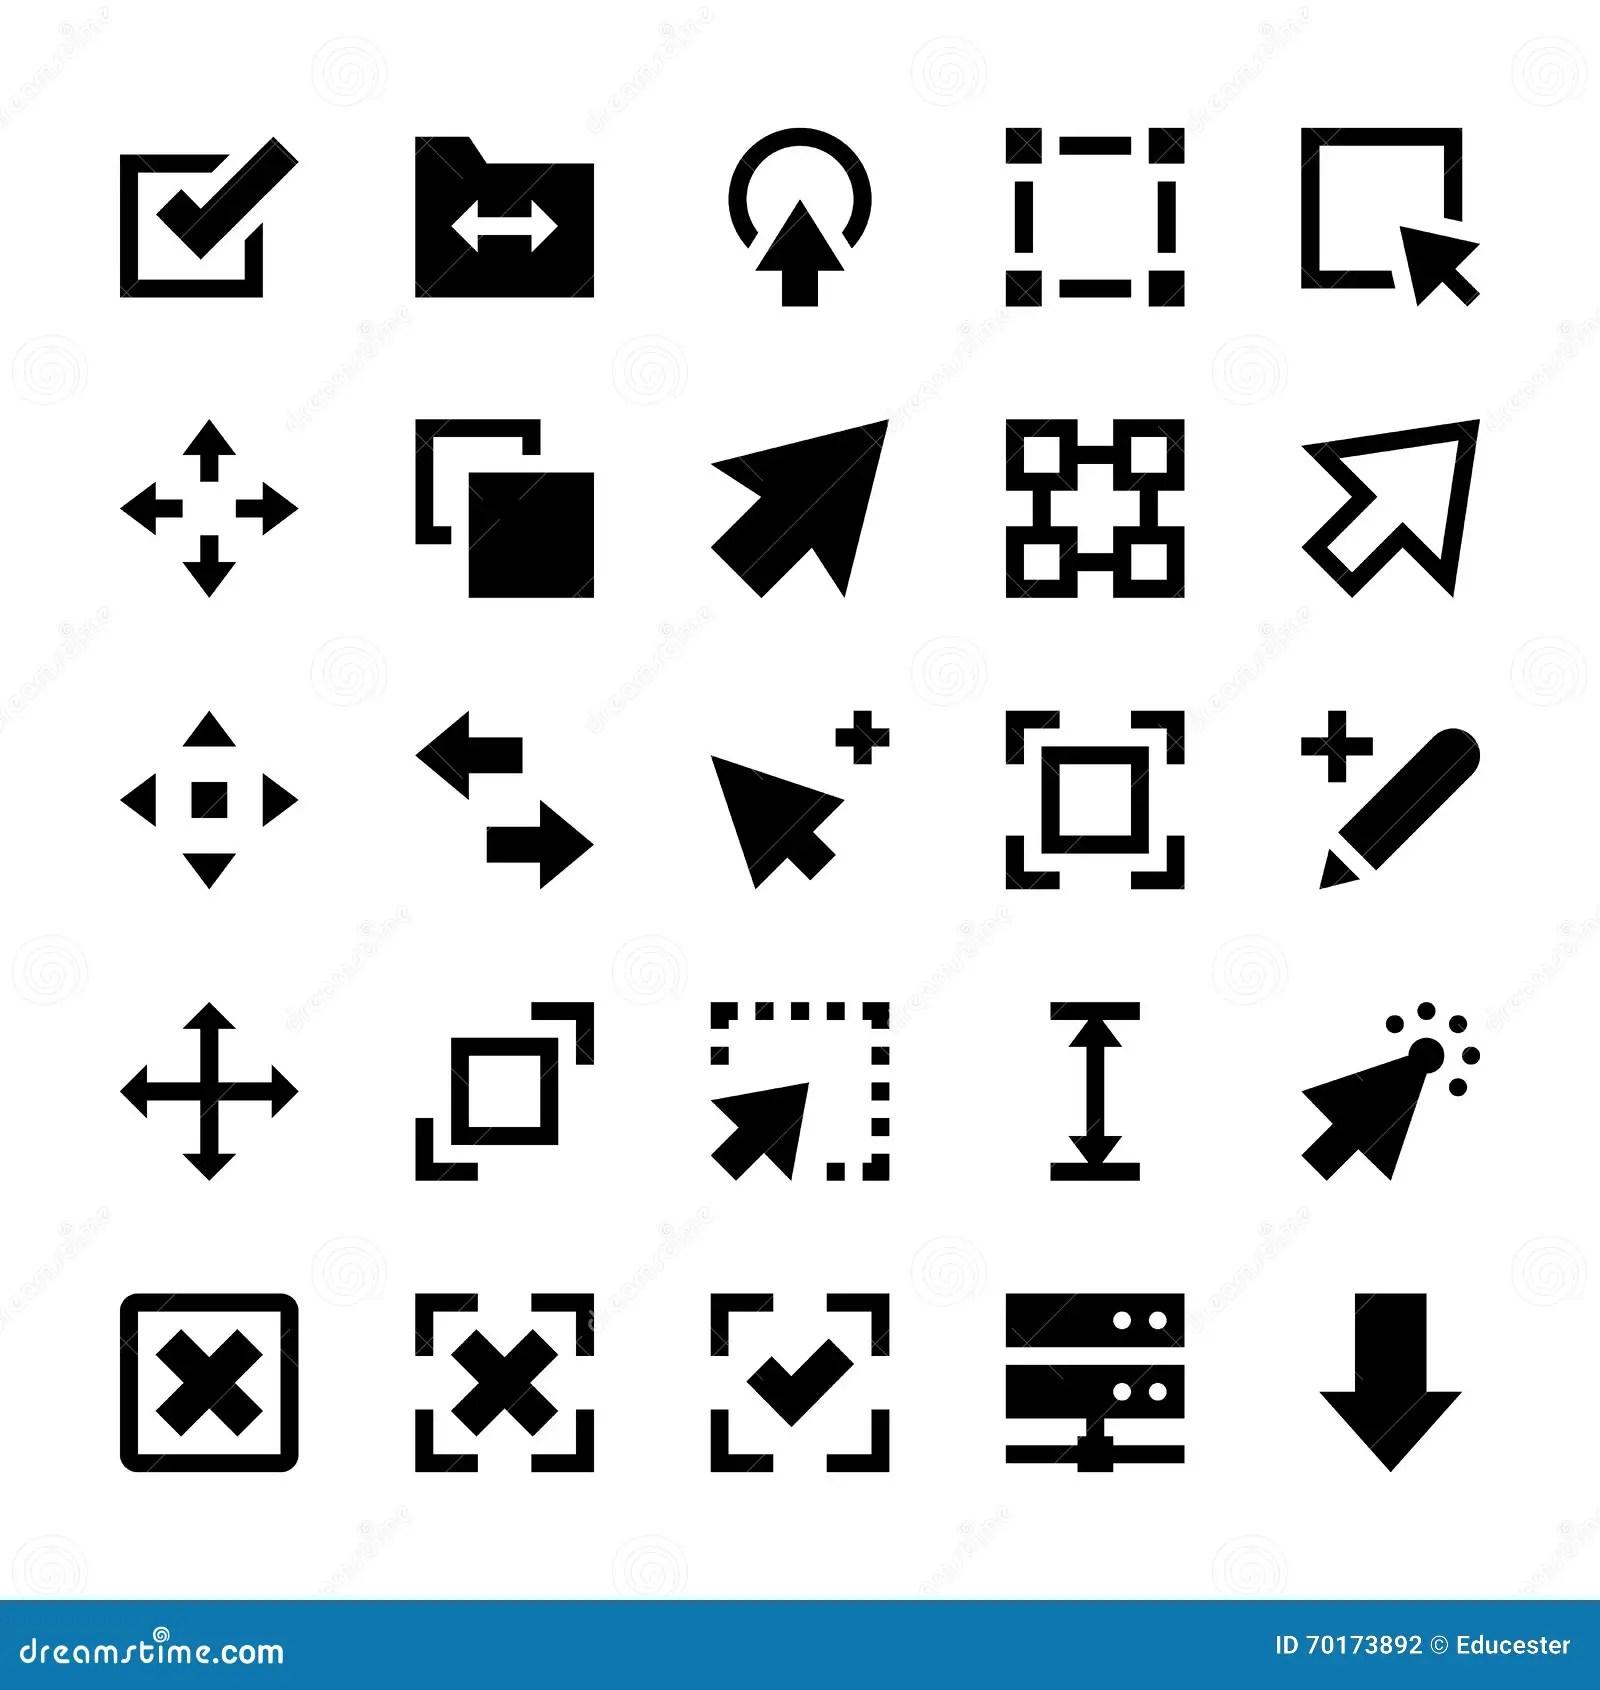 ikon in wiring diagram